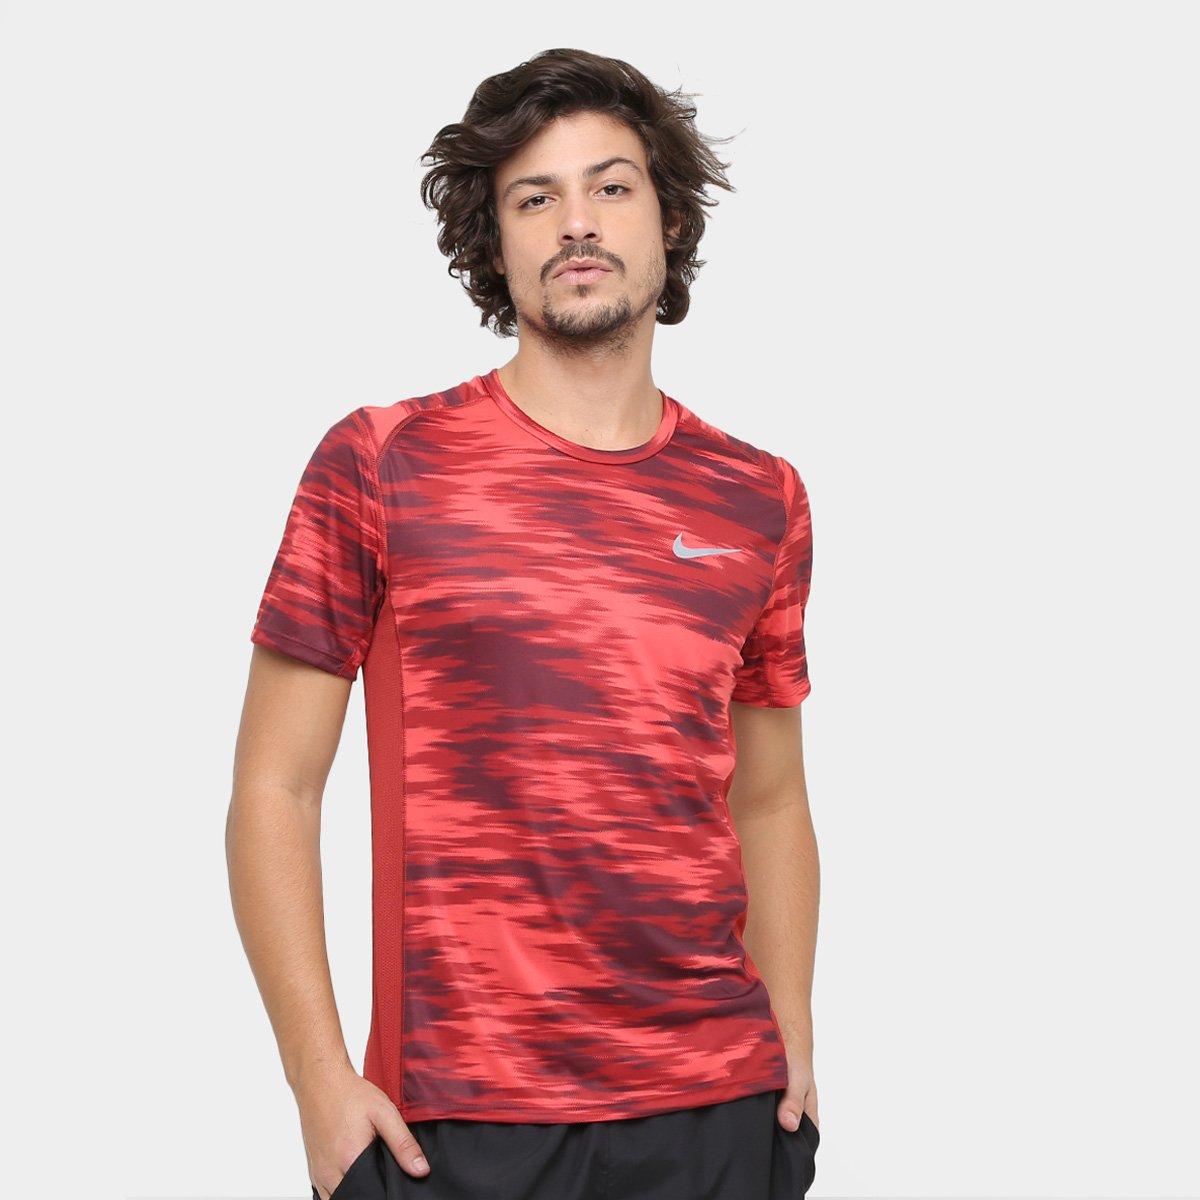 496a6ae42e Camiseta Nike Dry Miler Top Dri-Fit Masculina - Compre Agora